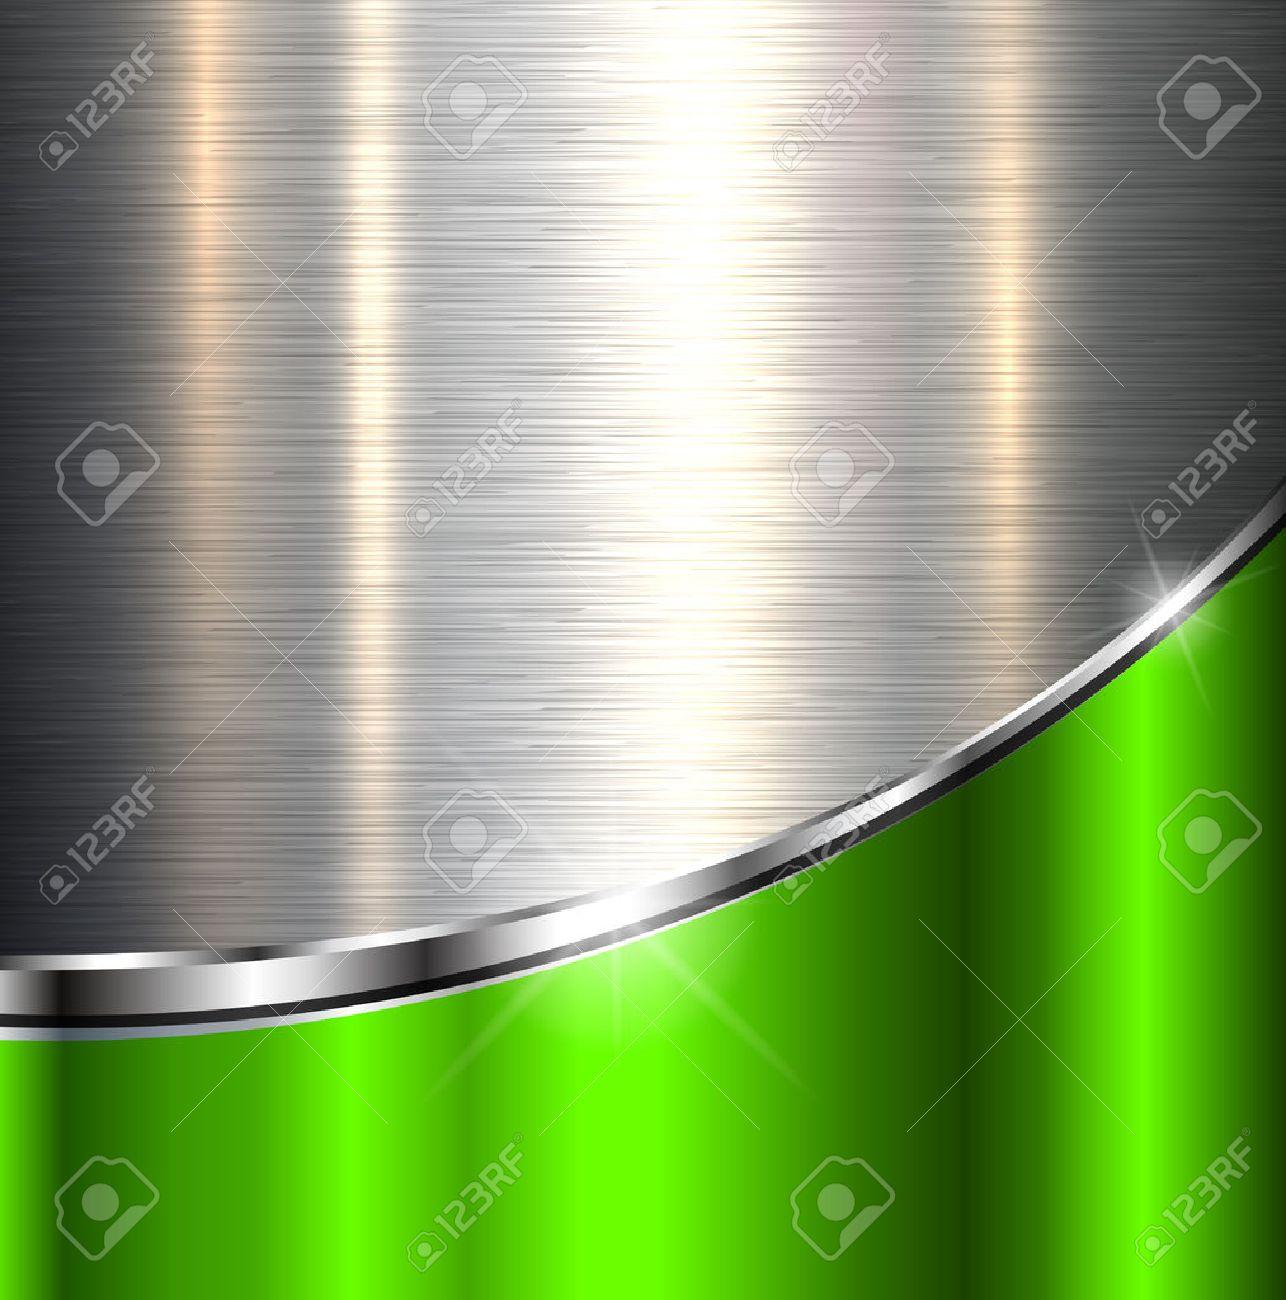 Metallic background polished steel texture, vector design. - 54925494